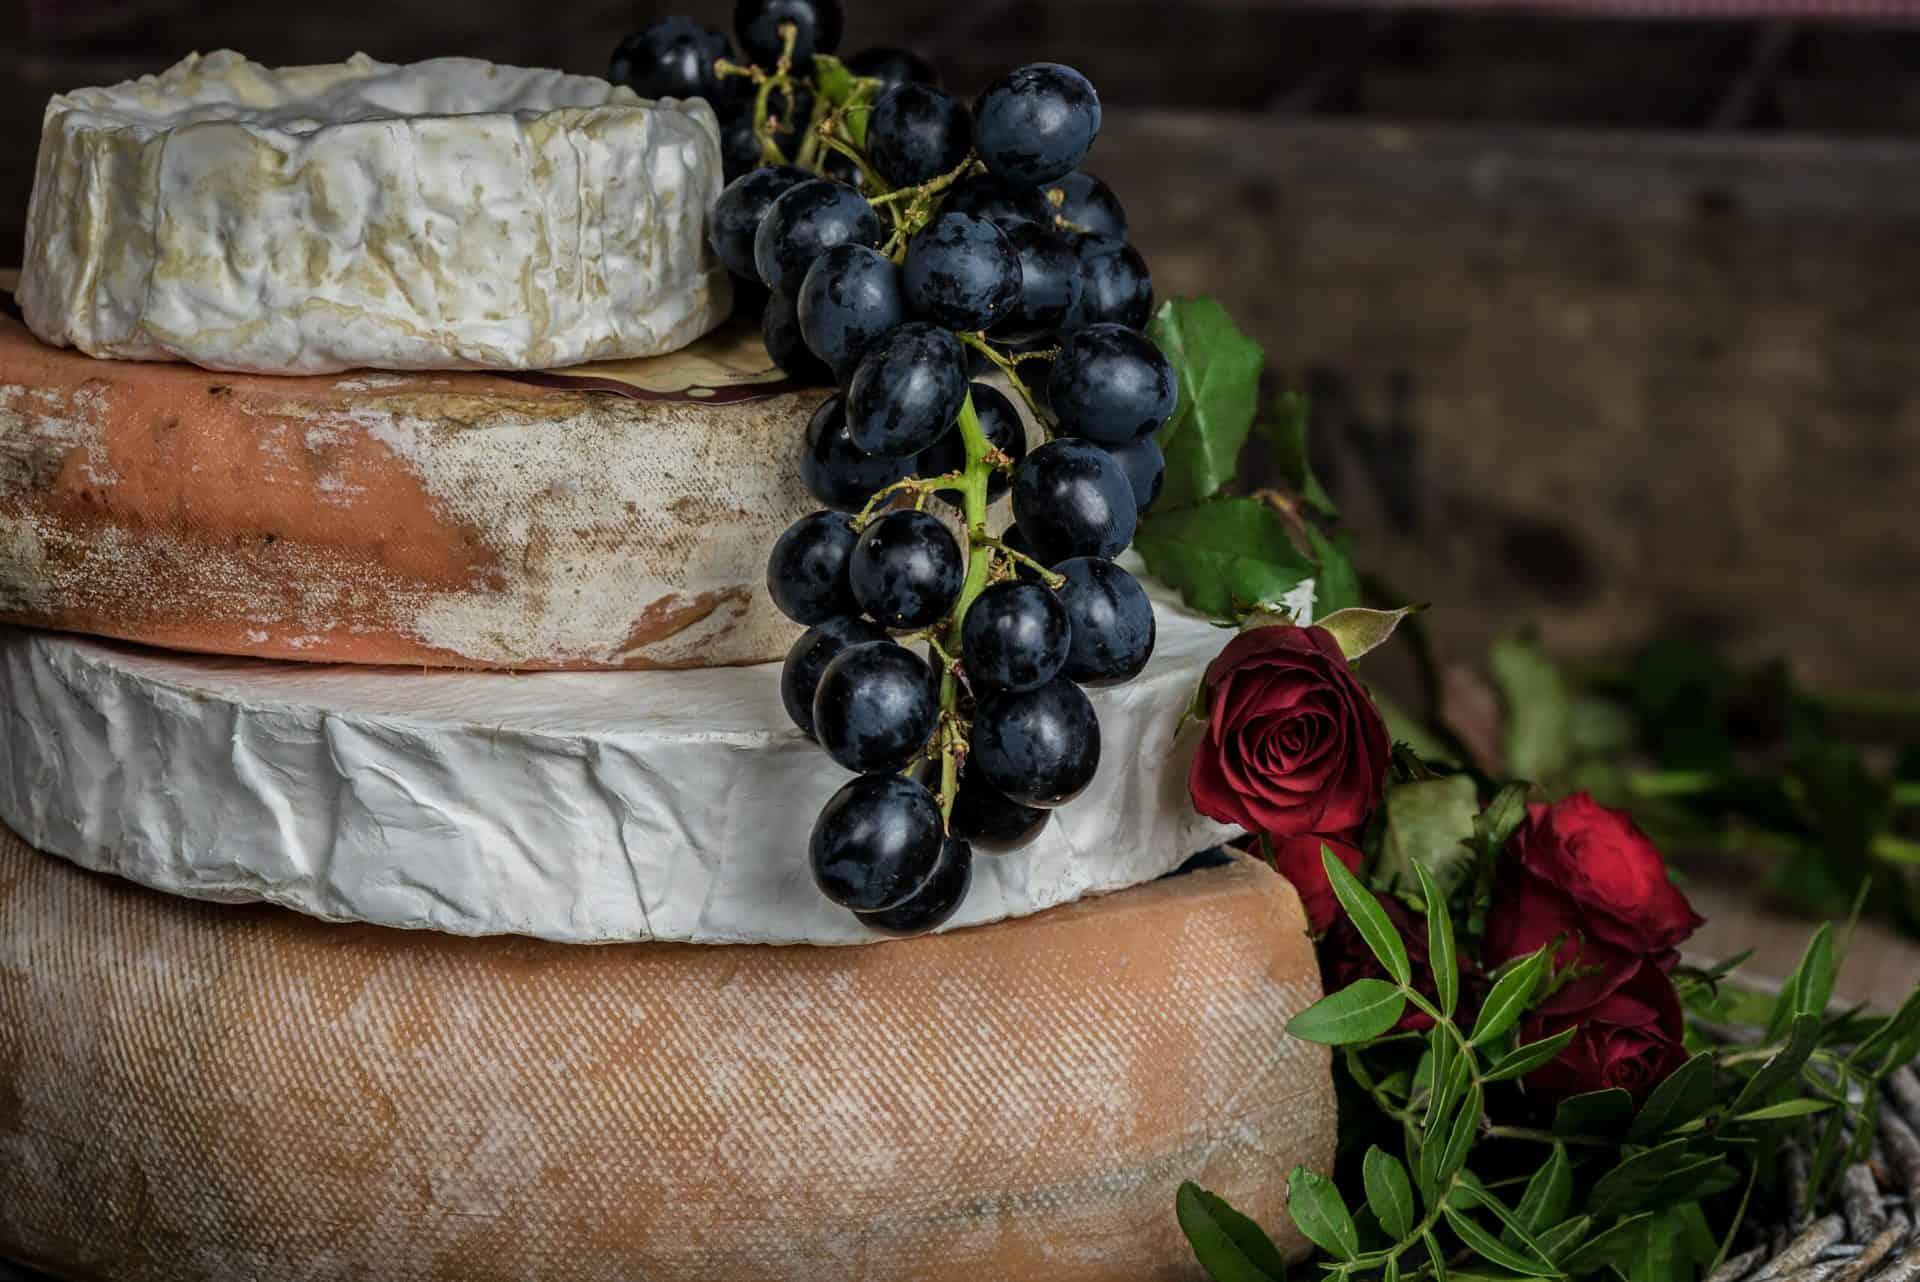 Det franske køkken fra enkelt til ekstravagant. Franske oste, udvalg